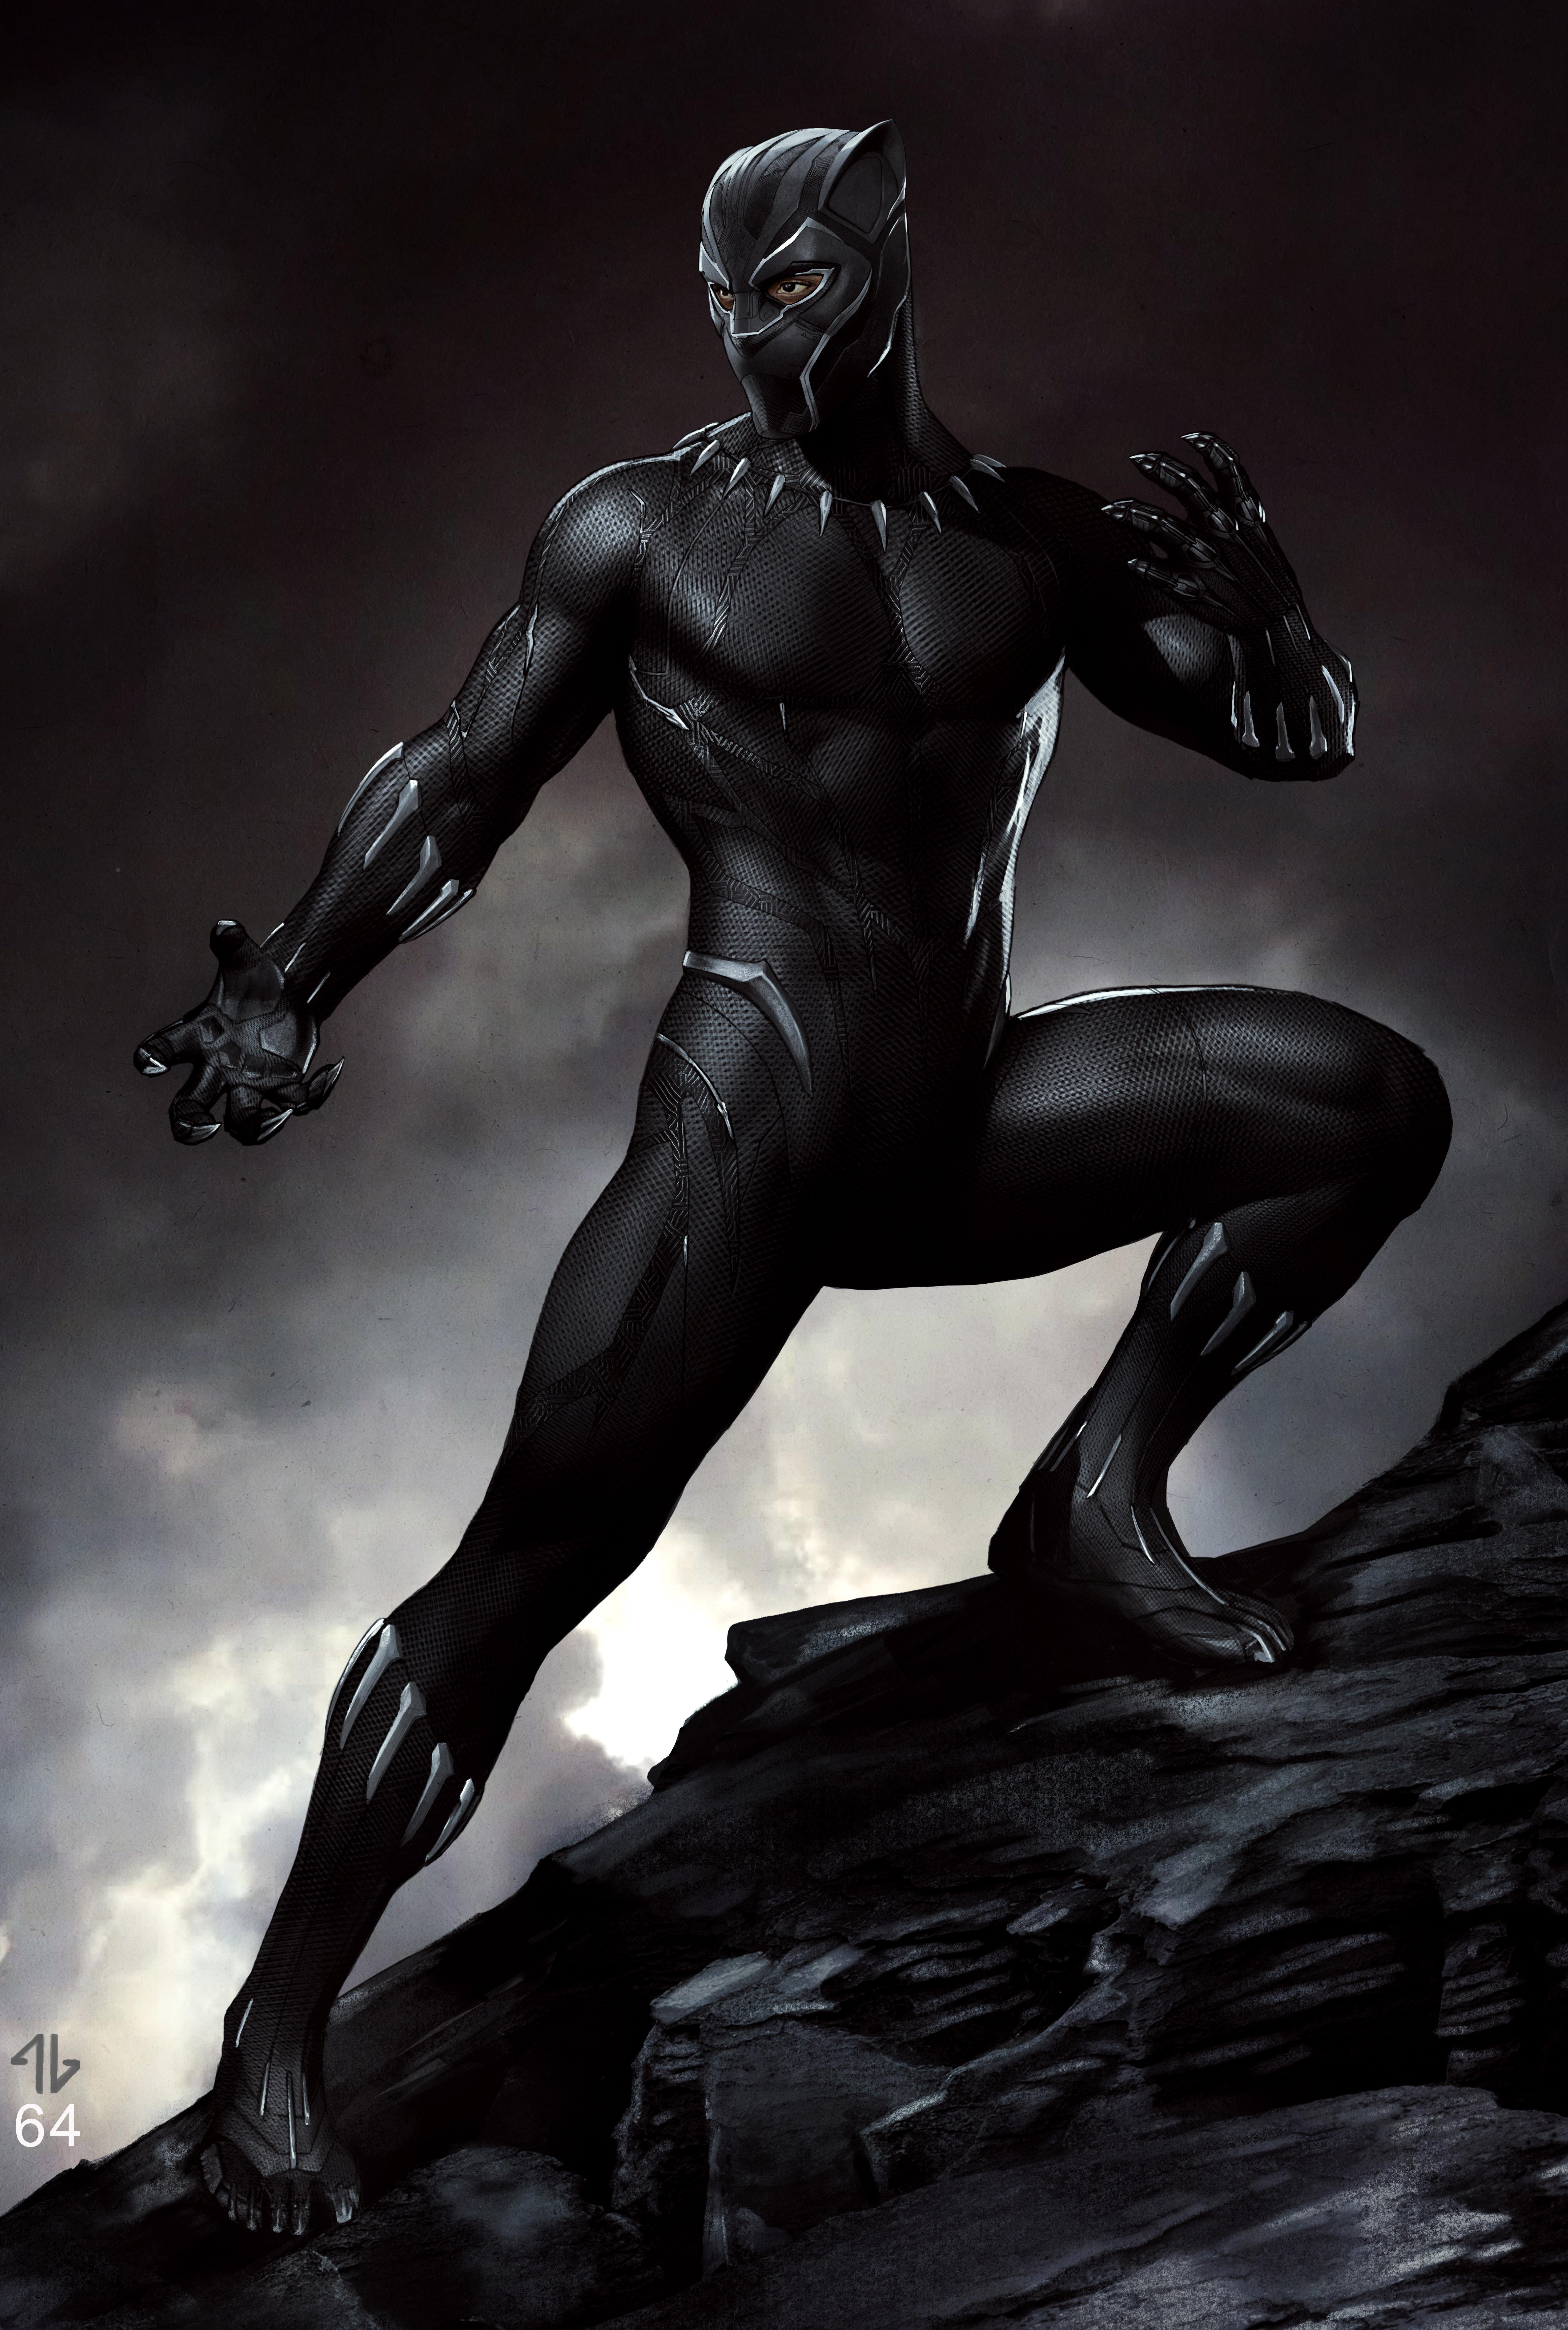 Marvel Studios' BLACK PANTHER                                                              Black Panther Conceptual Character and Costume Design Sketch                                                              Costume Design and Art: Ryan Meinderding and VisDev Team                                                              ©Marvel Studios 2018